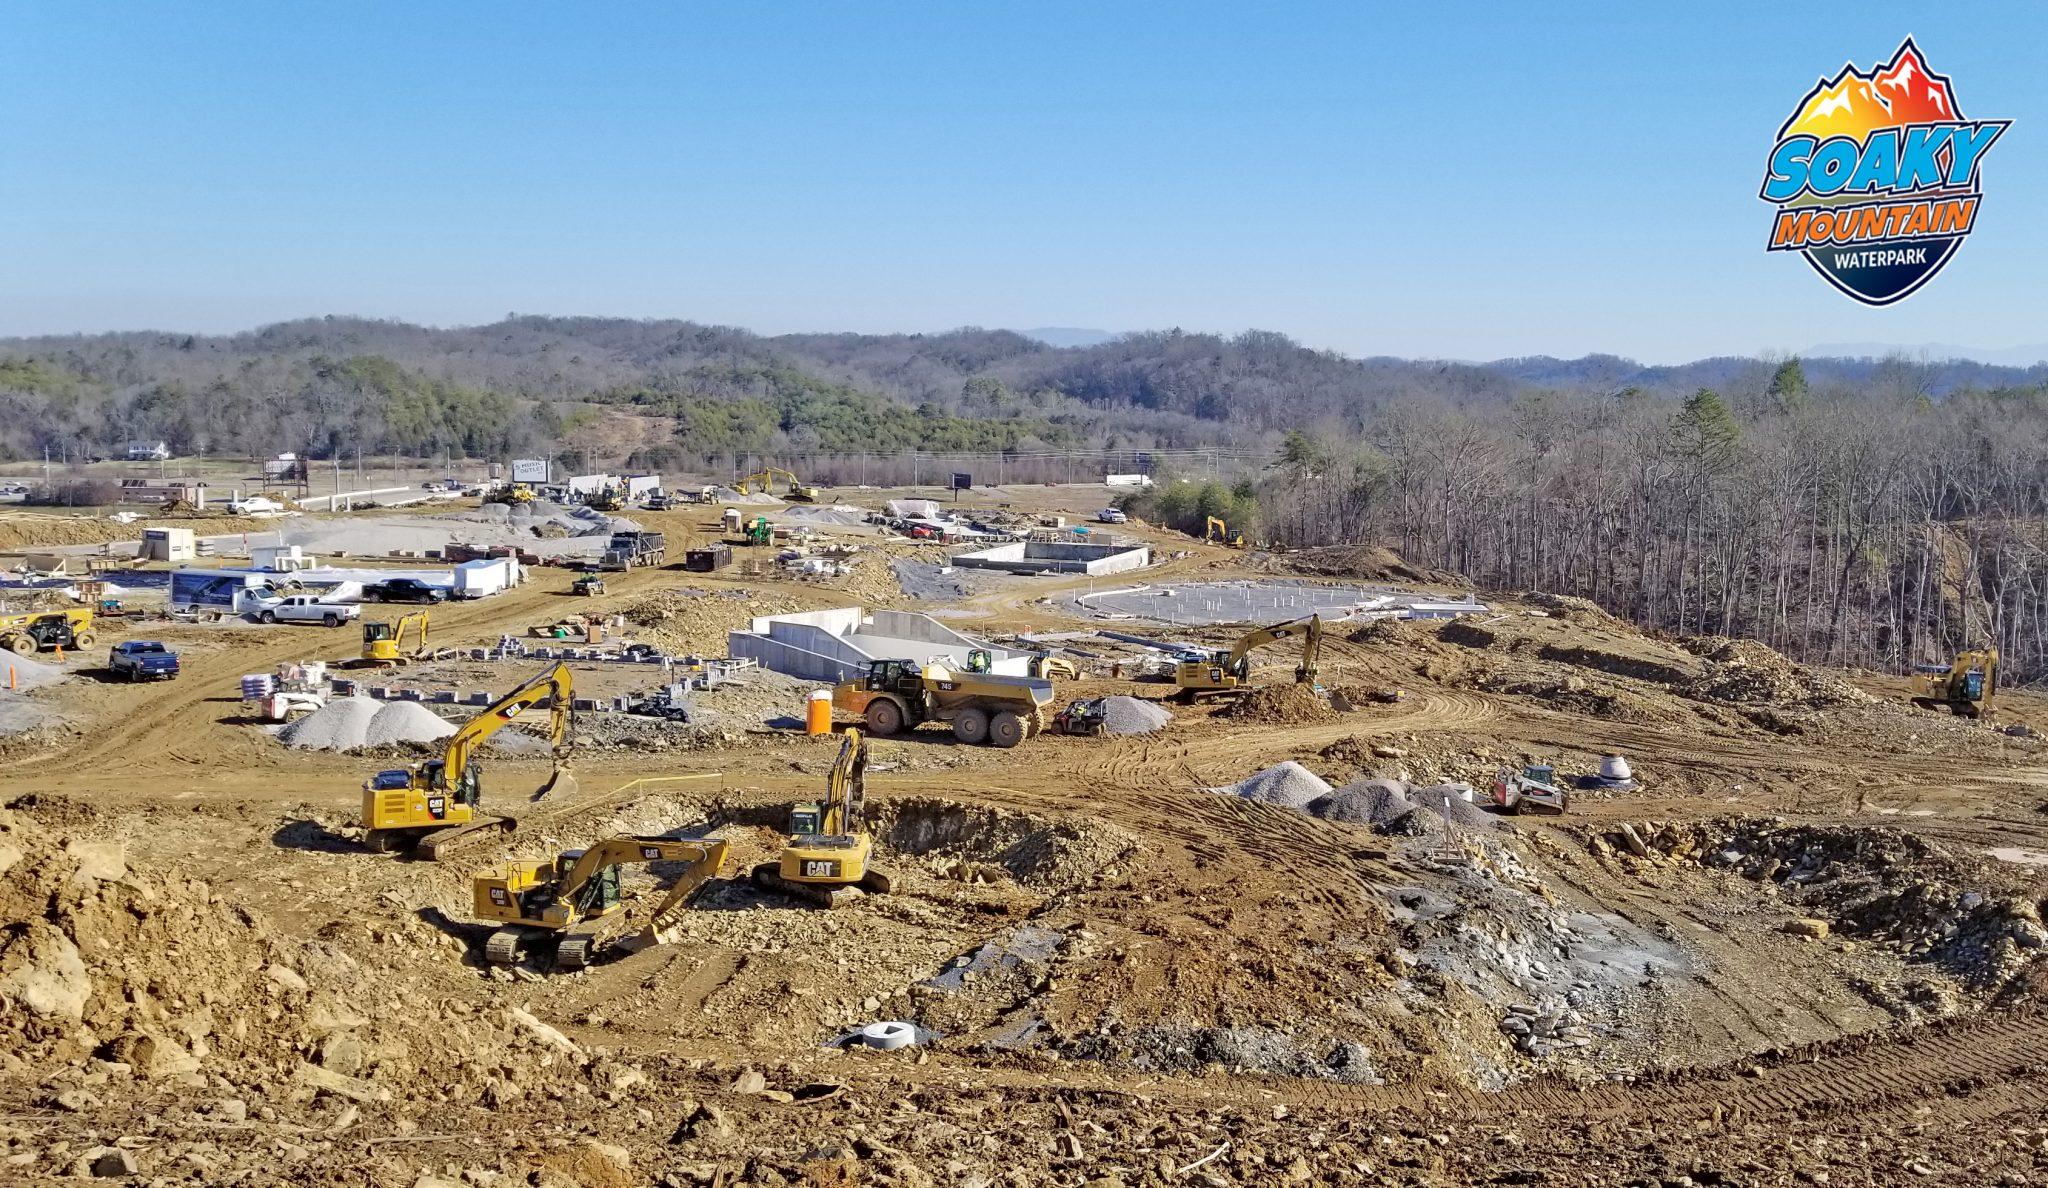 water park construction at soaky mountain